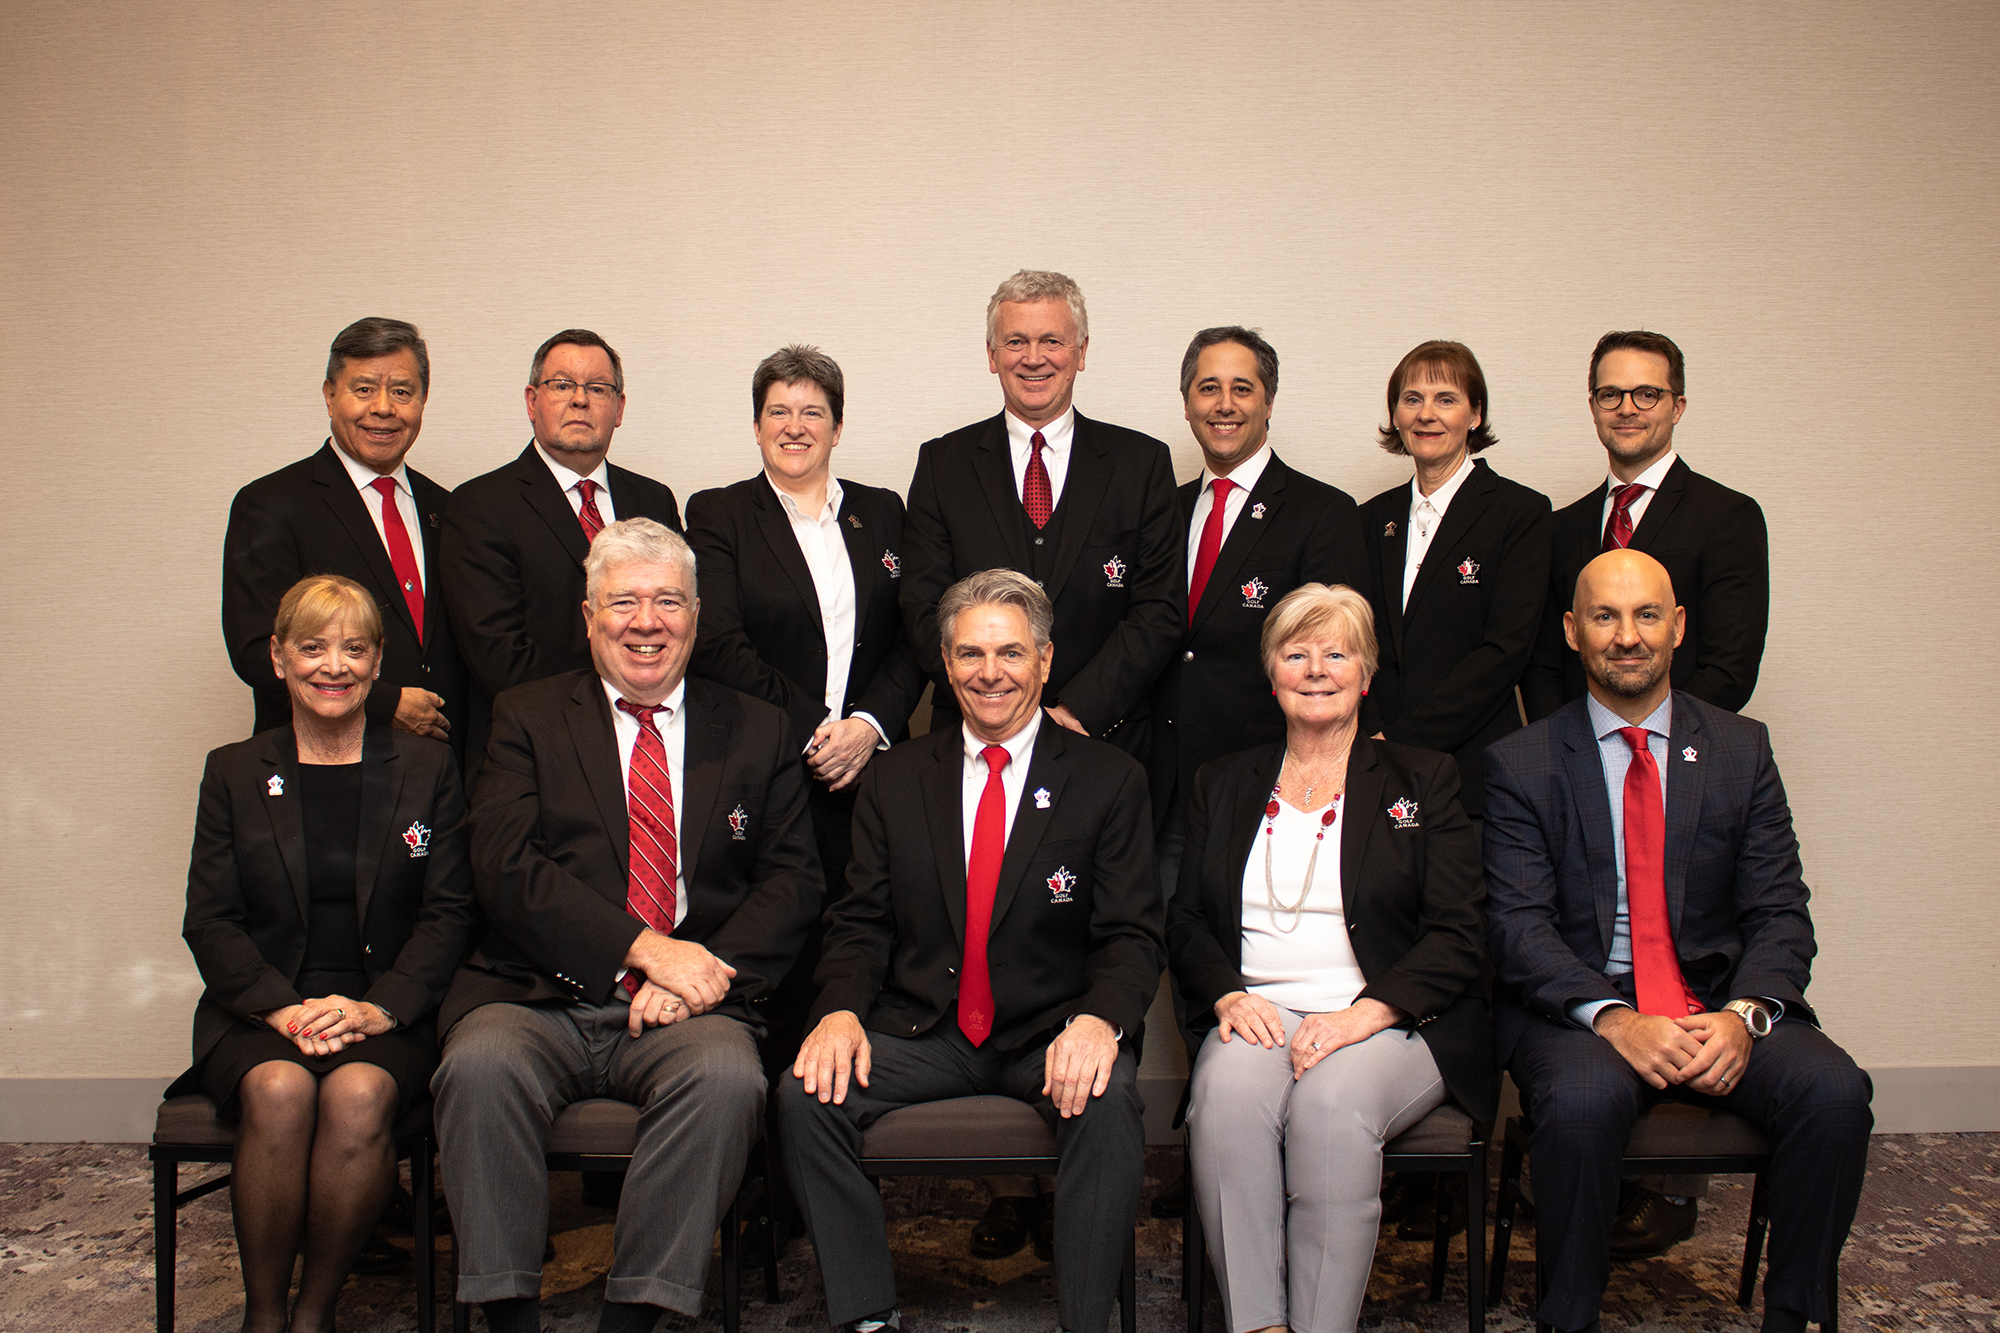 2020 Golf Canada Board of Directors